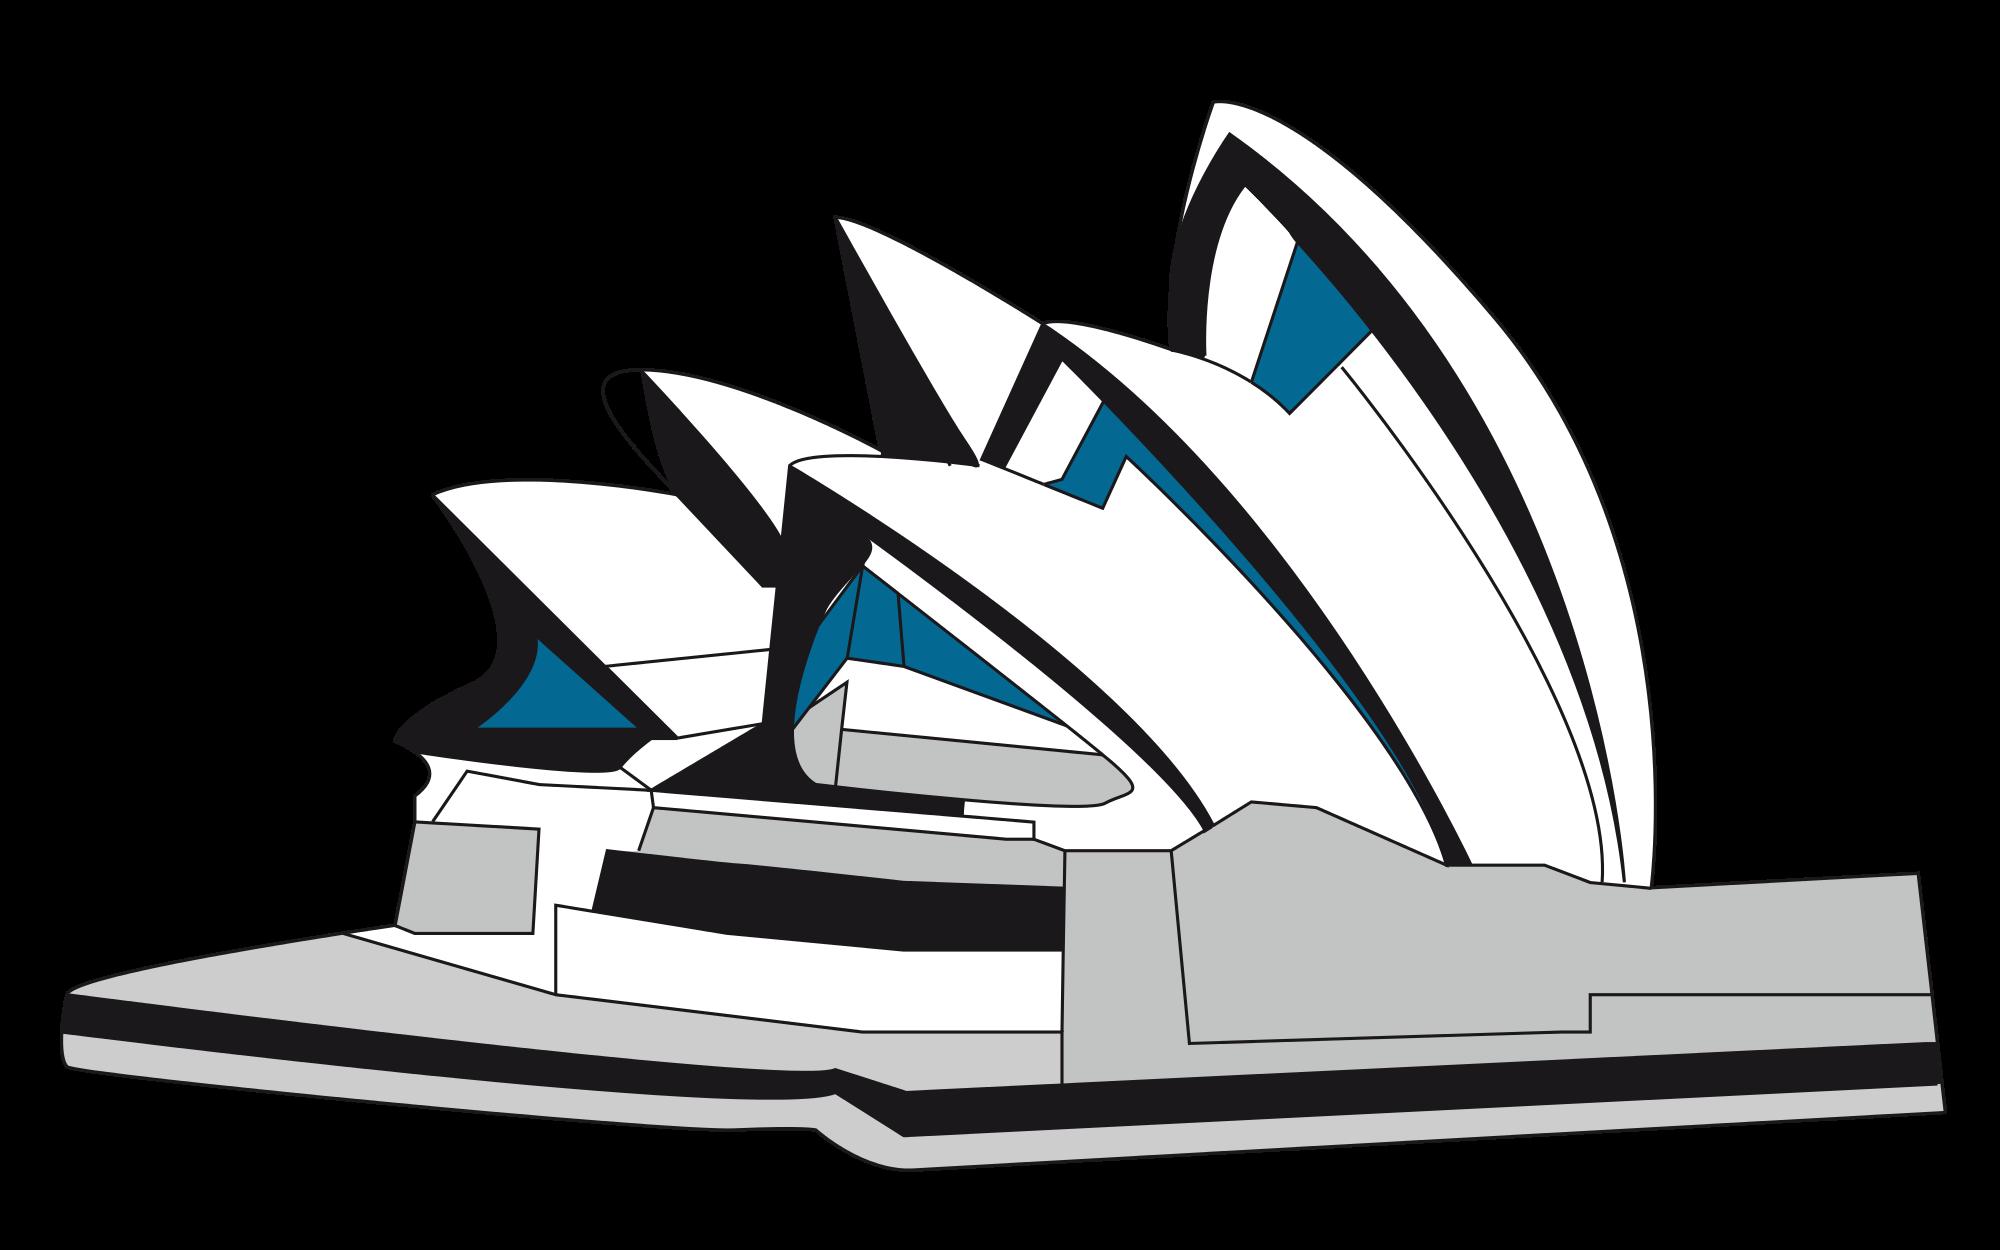 Clipart world landmarks. File icons sydney opera